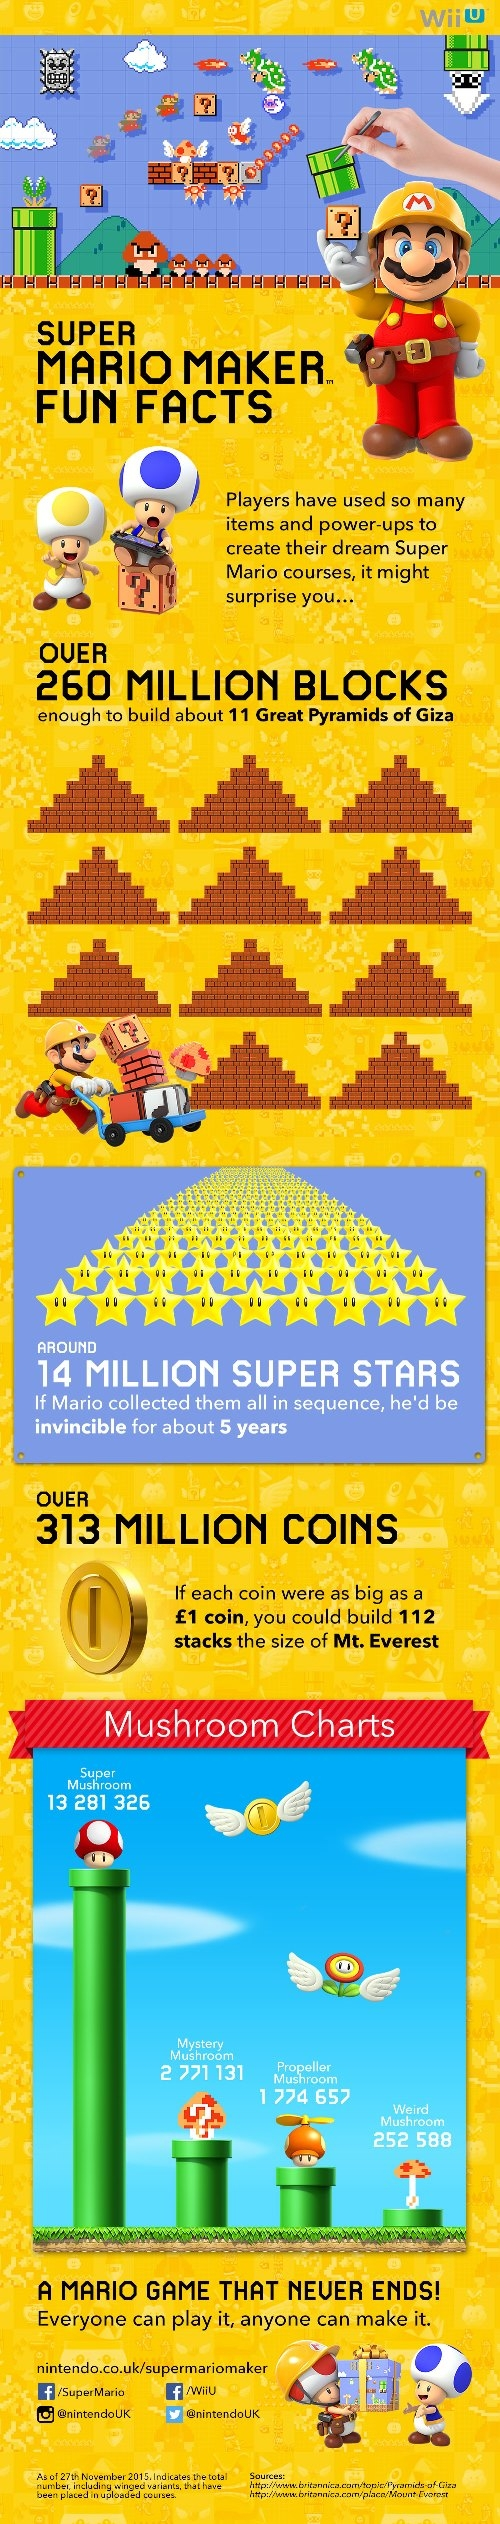 super_mario_maker_infographic